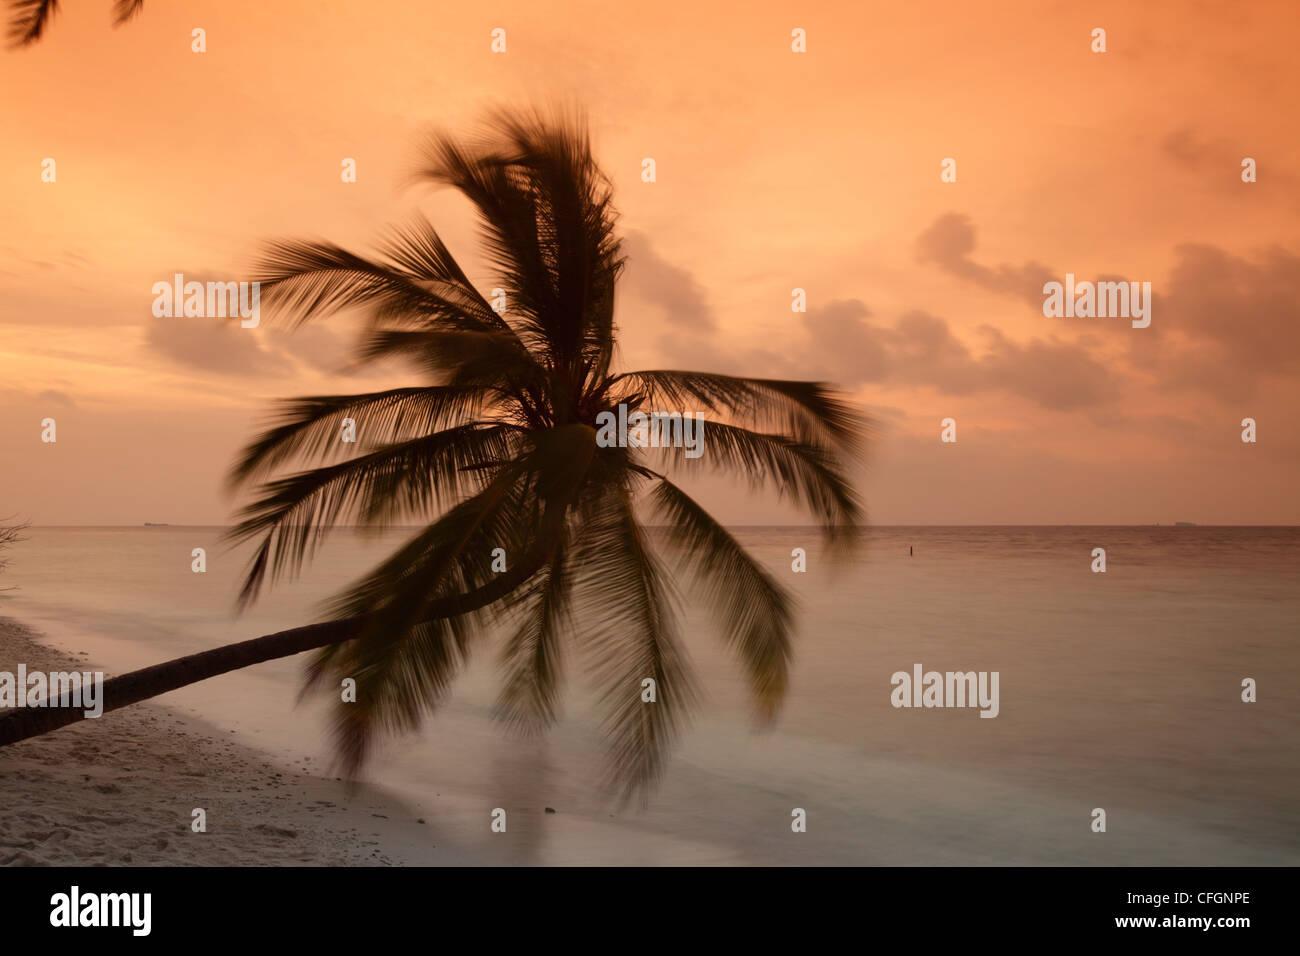 Palm on the beach at sunset, Filitheyo island, Maldives Stock Photo